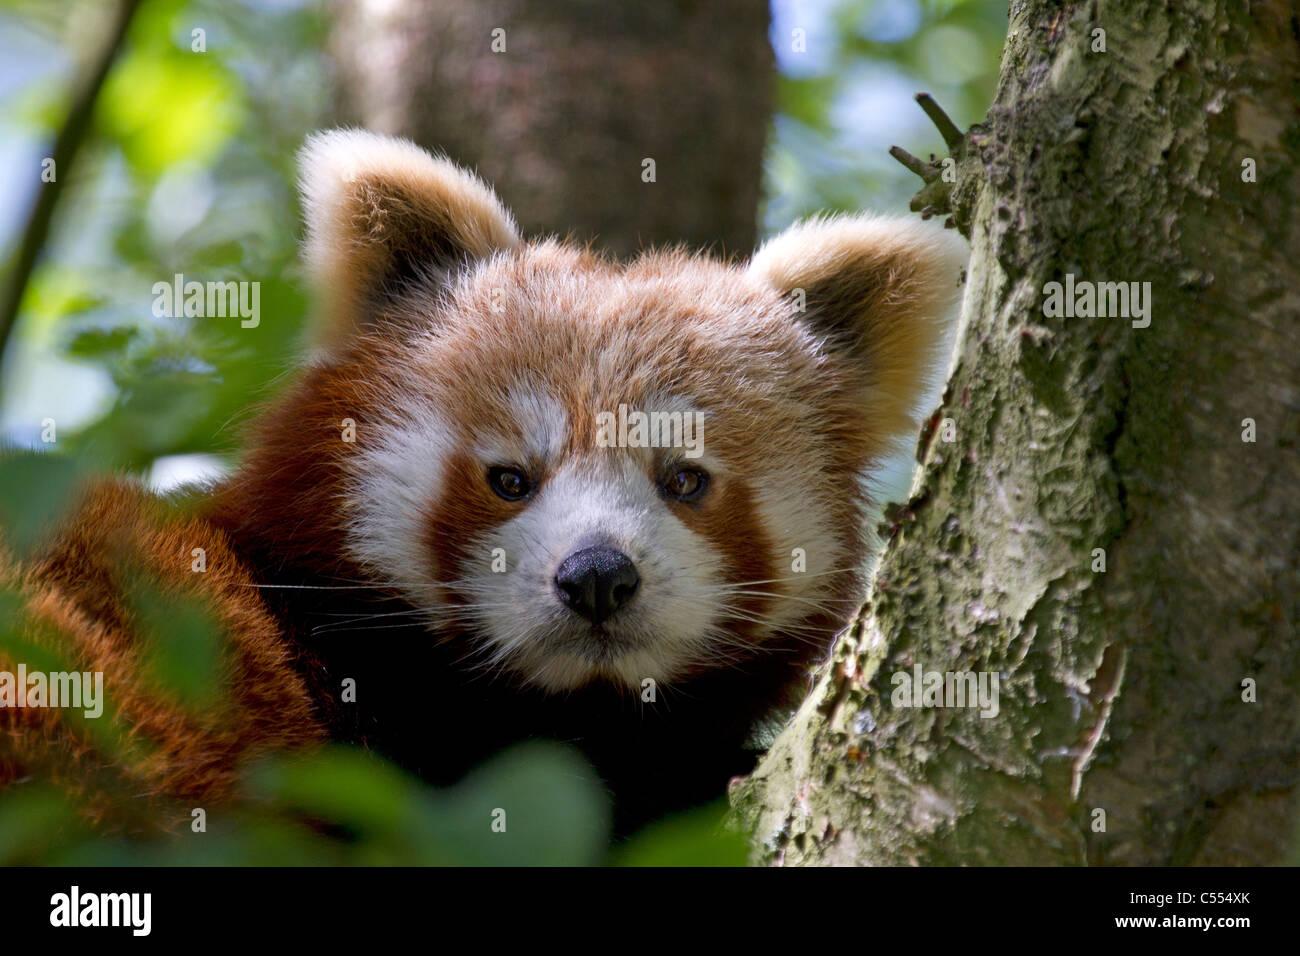 Le panda rouge, Ailurus fulgens repose dans l'arbre Photo Stock